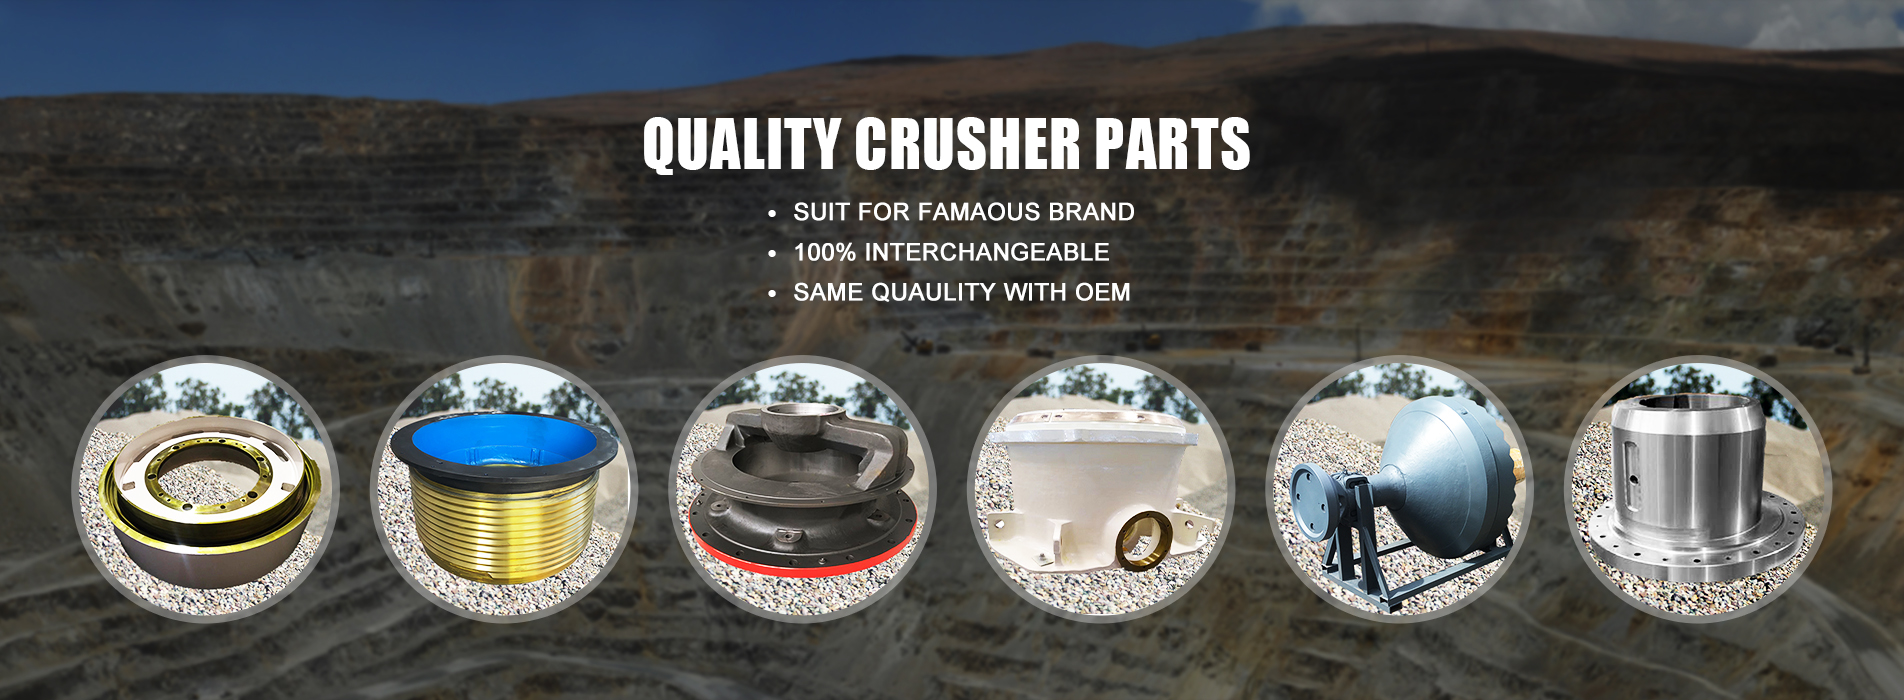 crusher parts  banner3.jpg